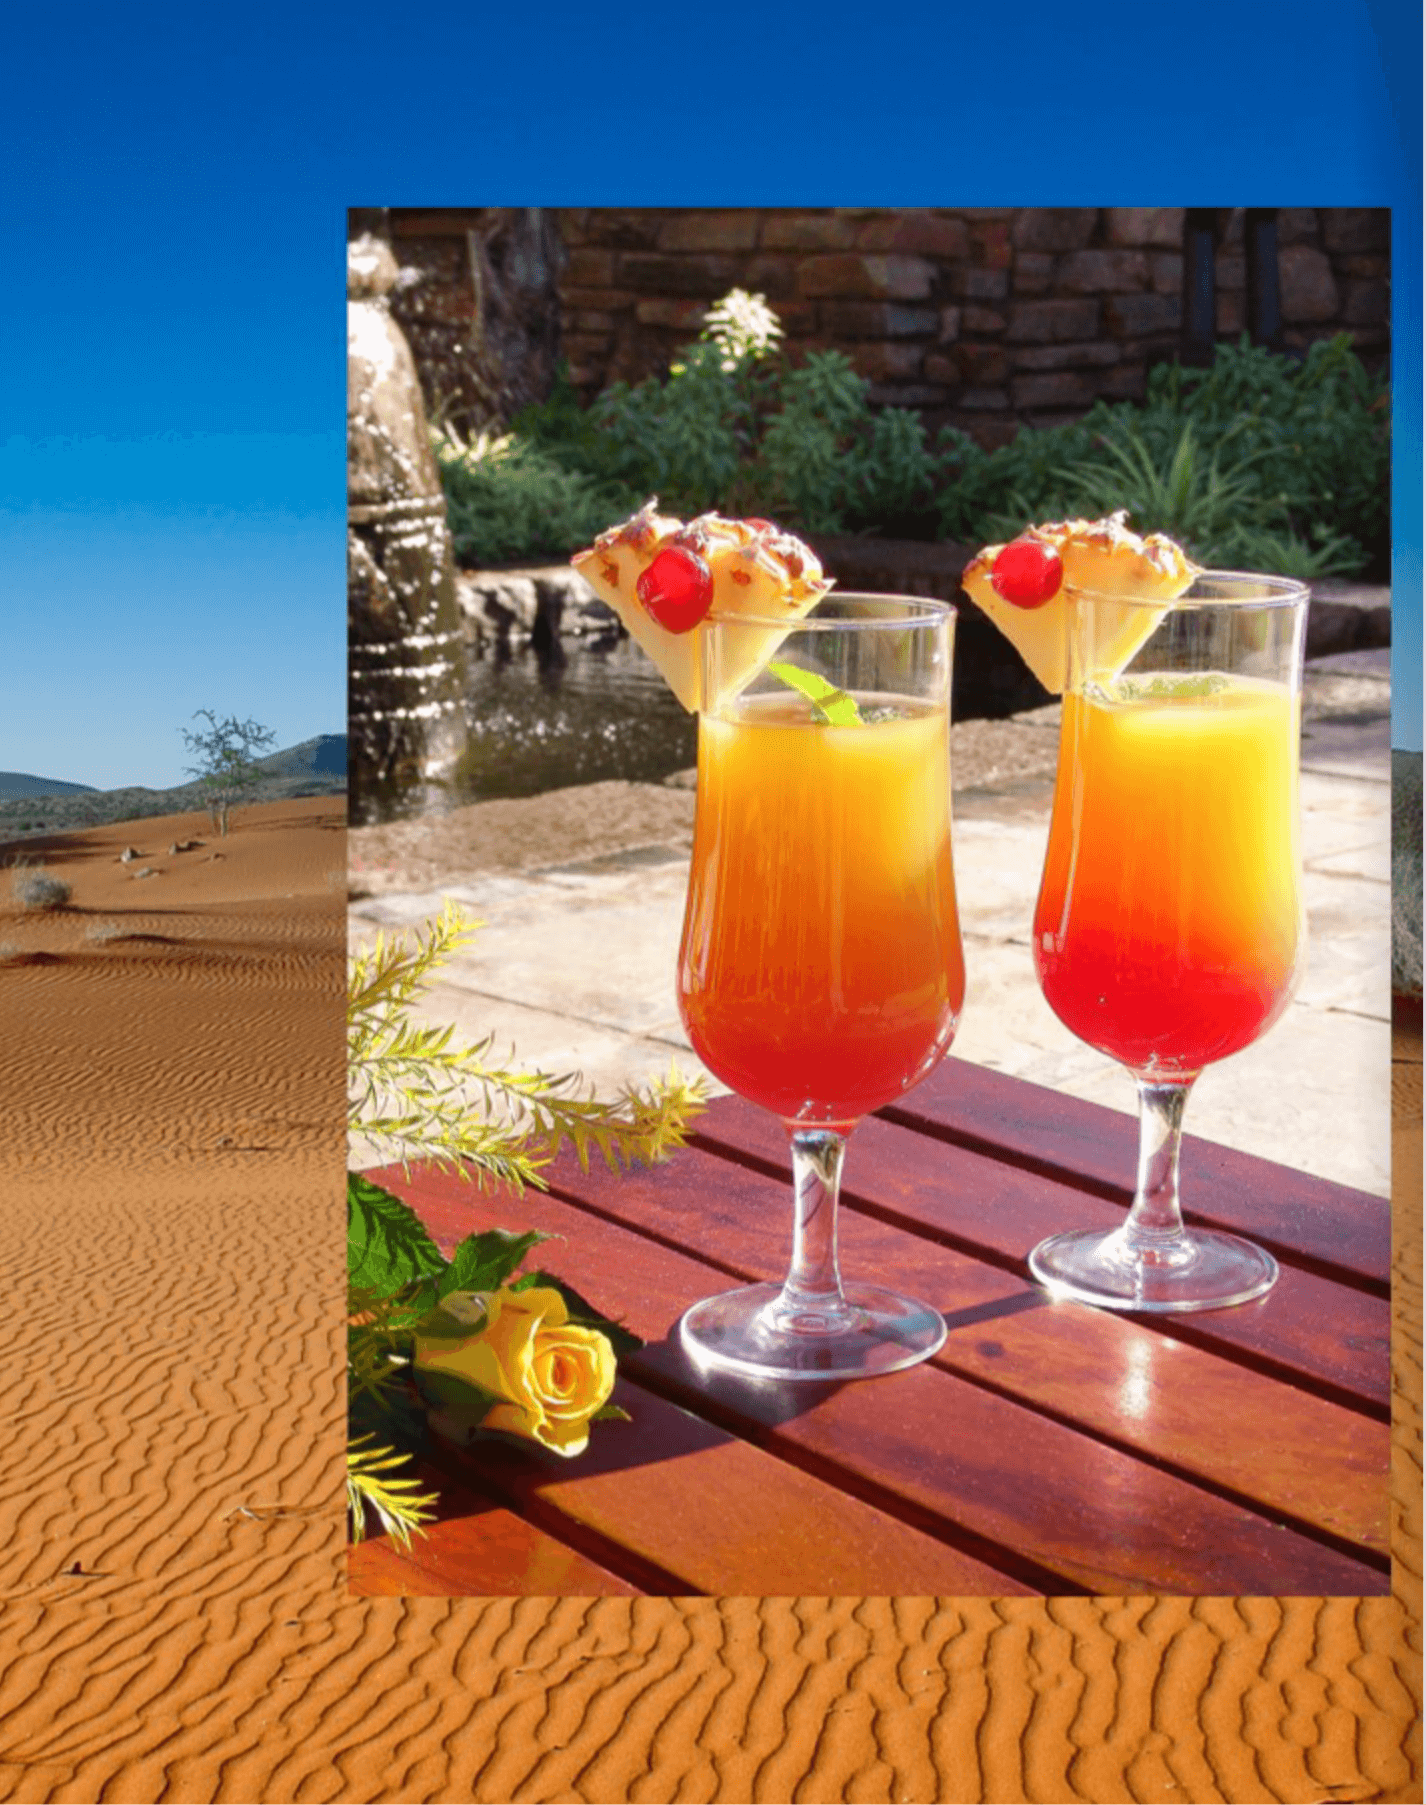 Digital Advertising Image - Kalahari Game Lodge